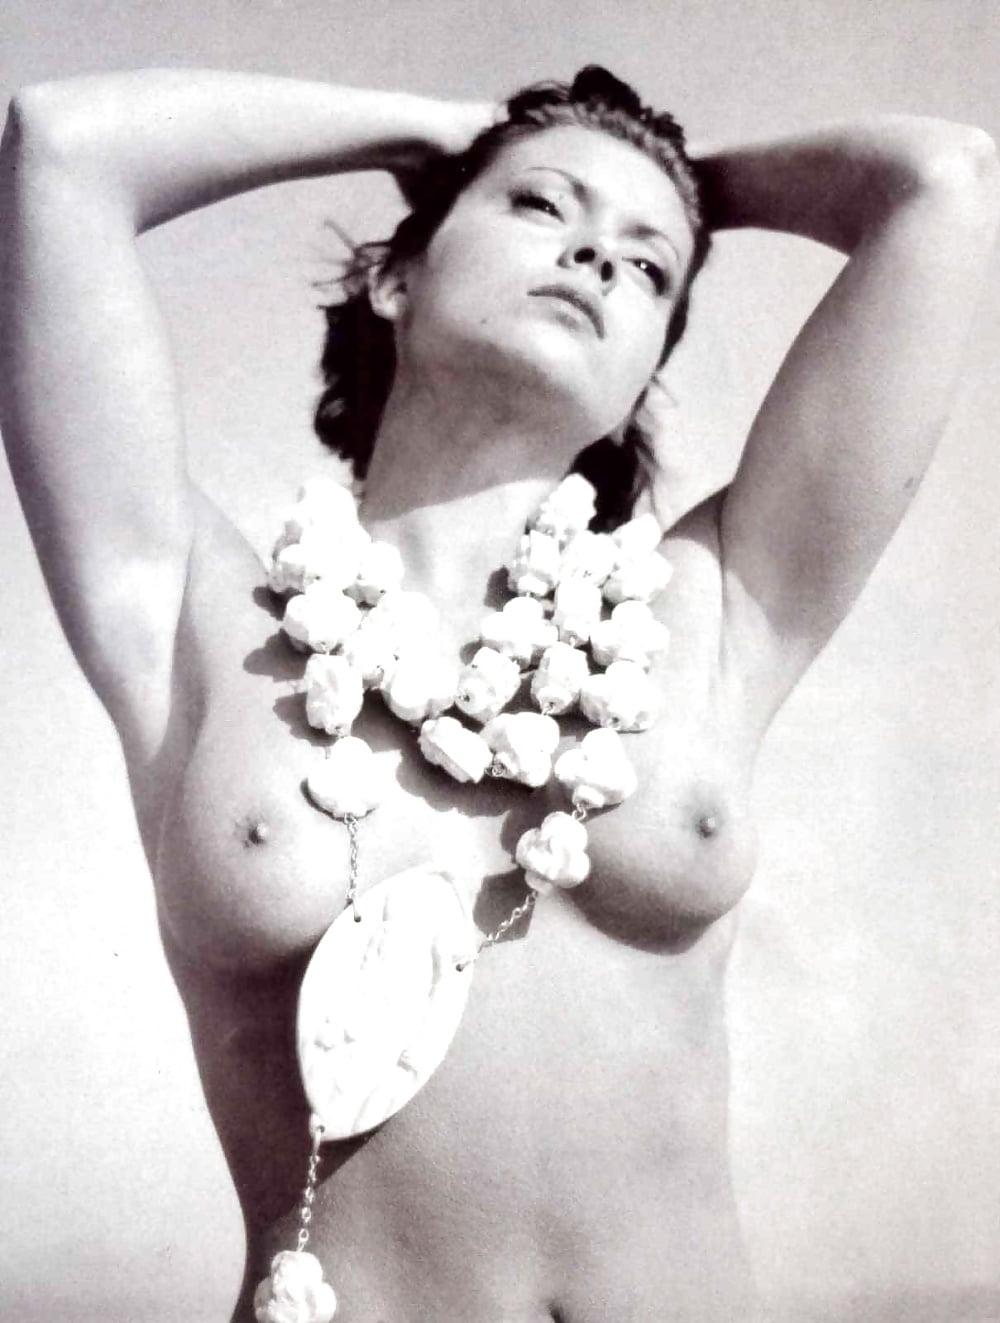 alyssa-milano-nude-in-magazine-nigerian-girls-hymen-pi